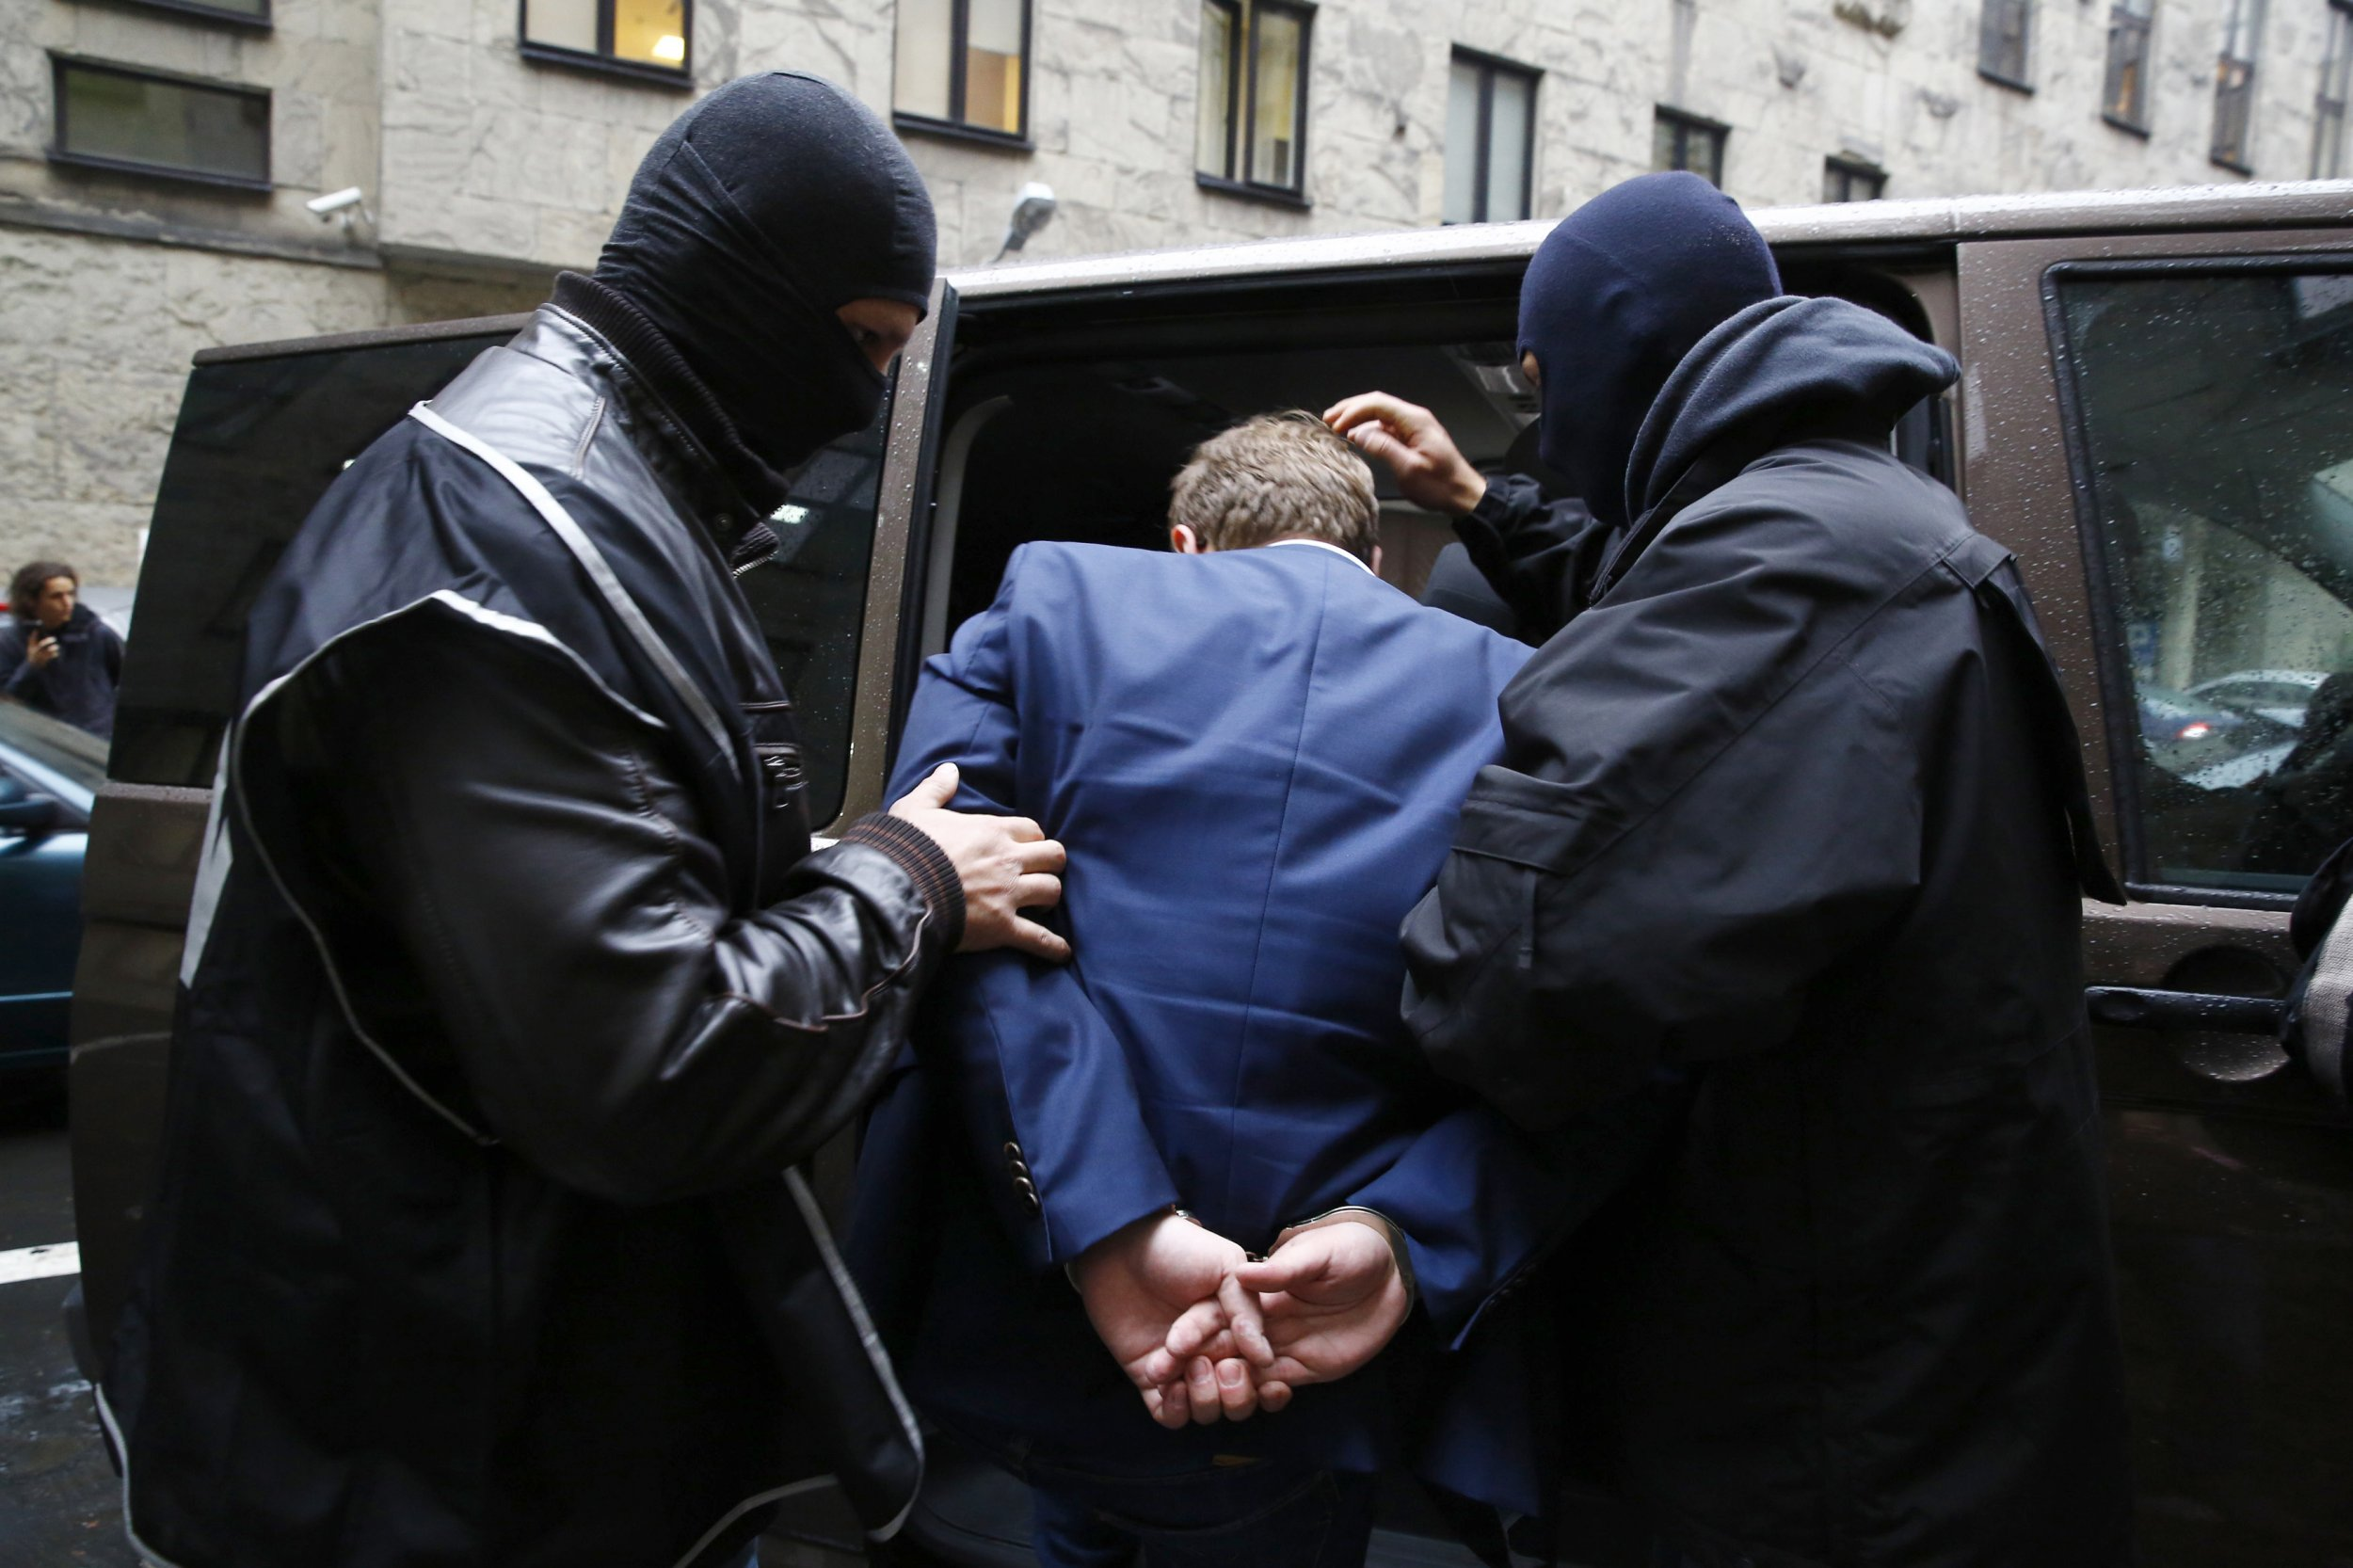 Polish security officials arrest man